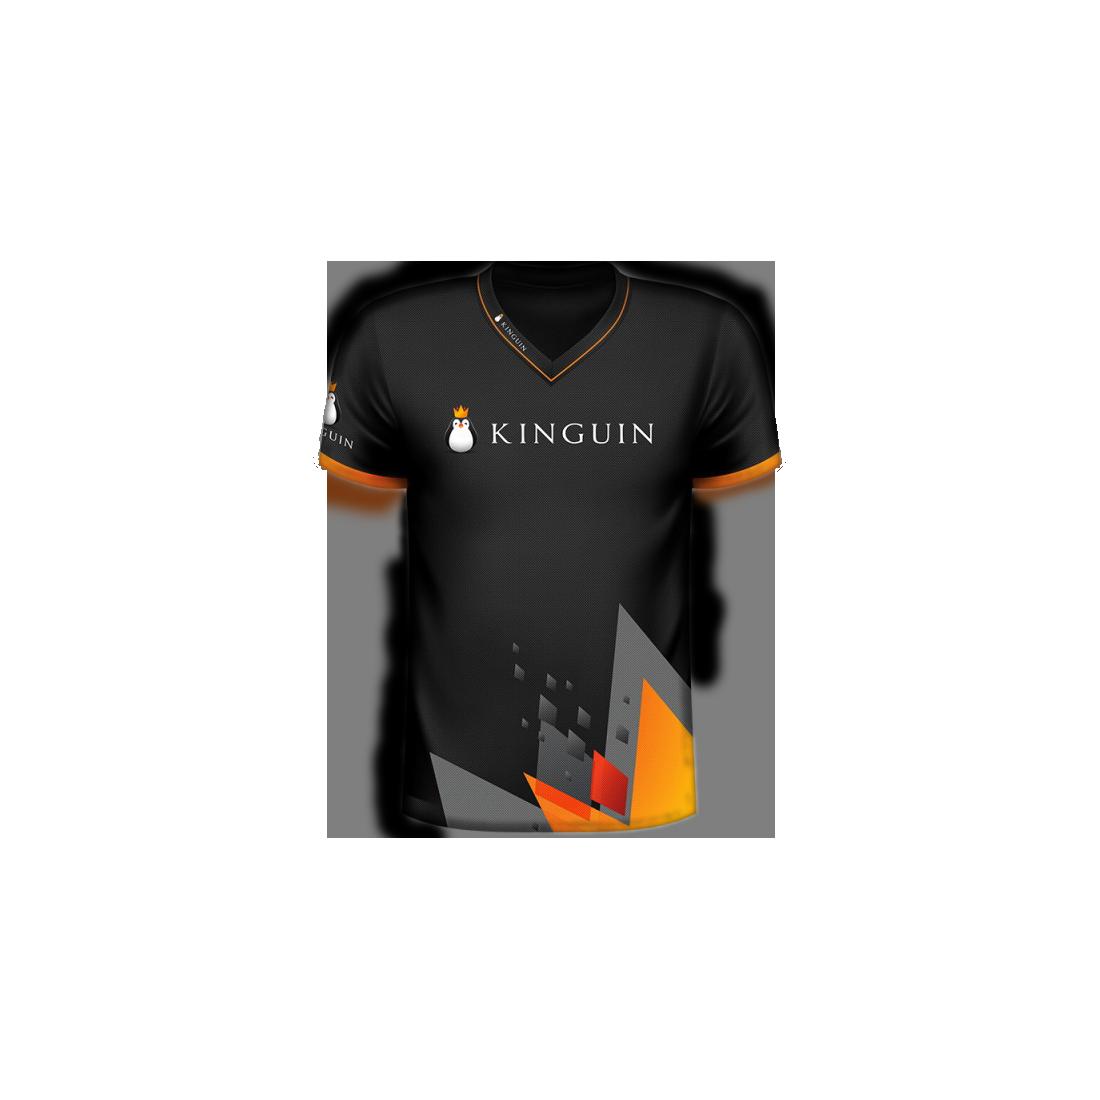 Koszulka Kinguin - rozmiar S